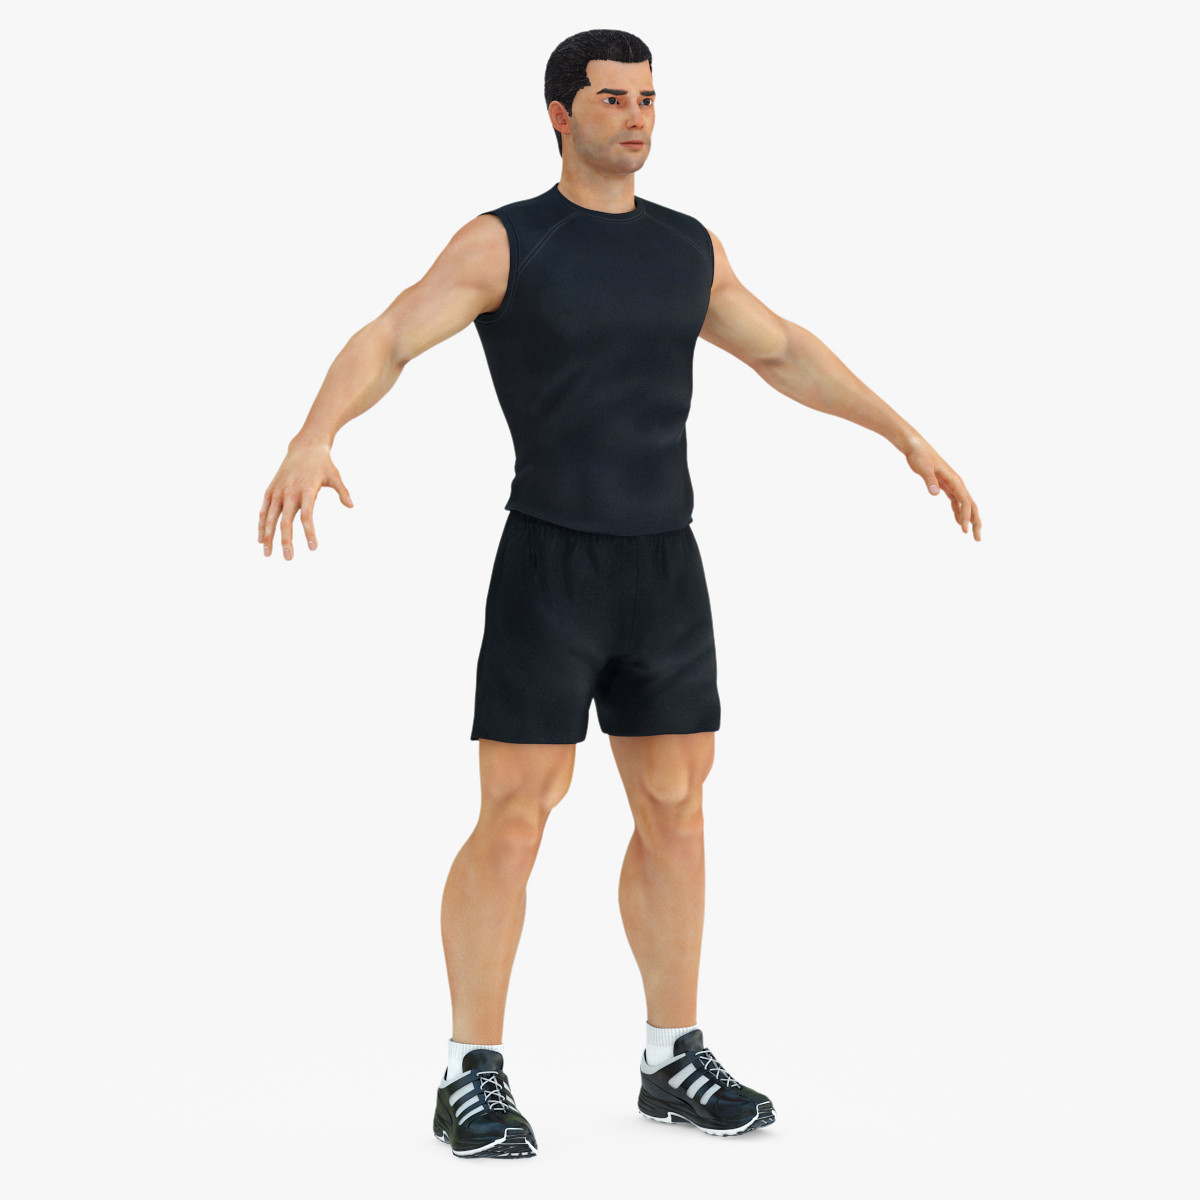 1_Athlete Male.jpg